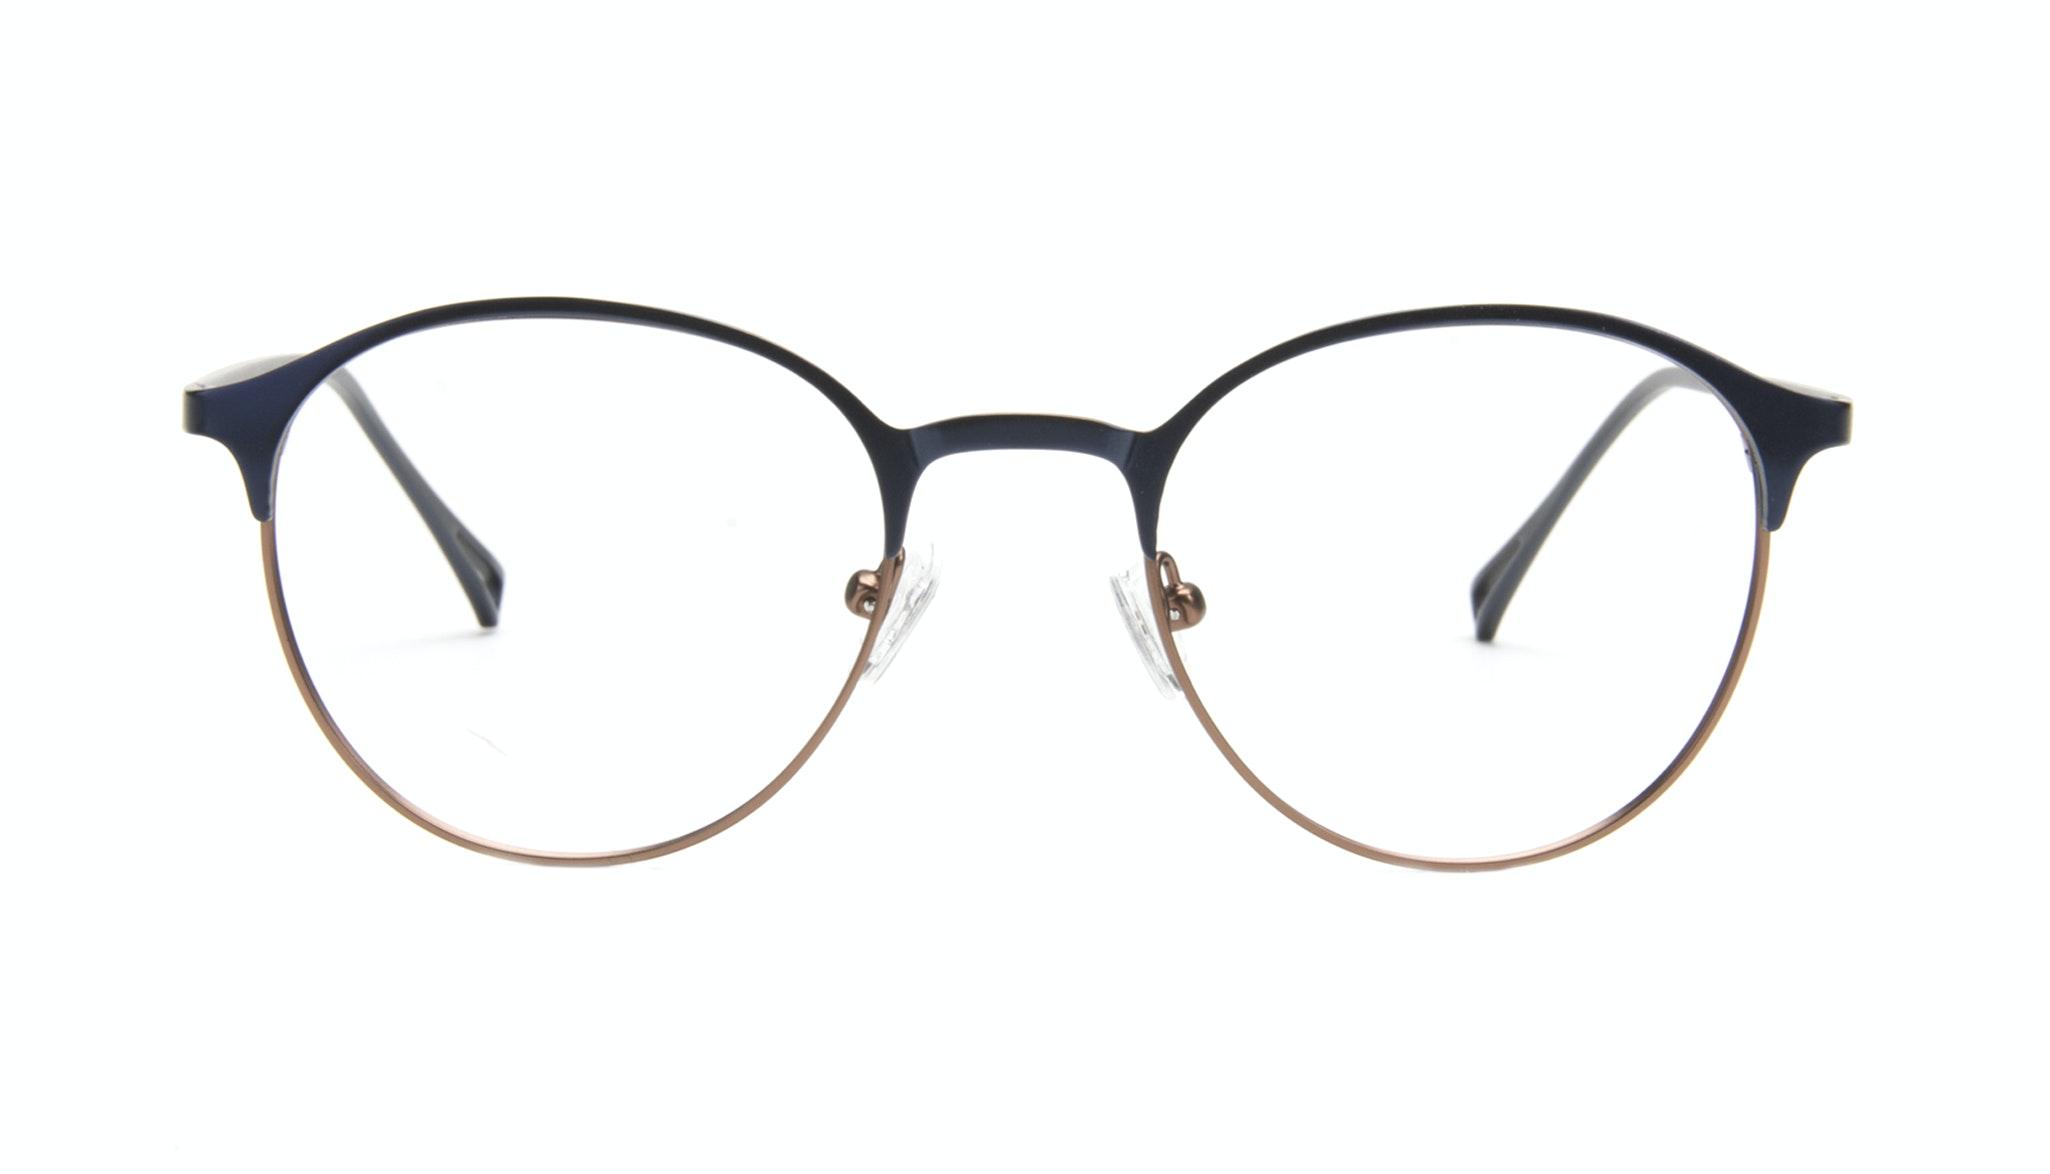 Affordable Fashion Glasses Round Eyeglasses Women Bay Marine Front